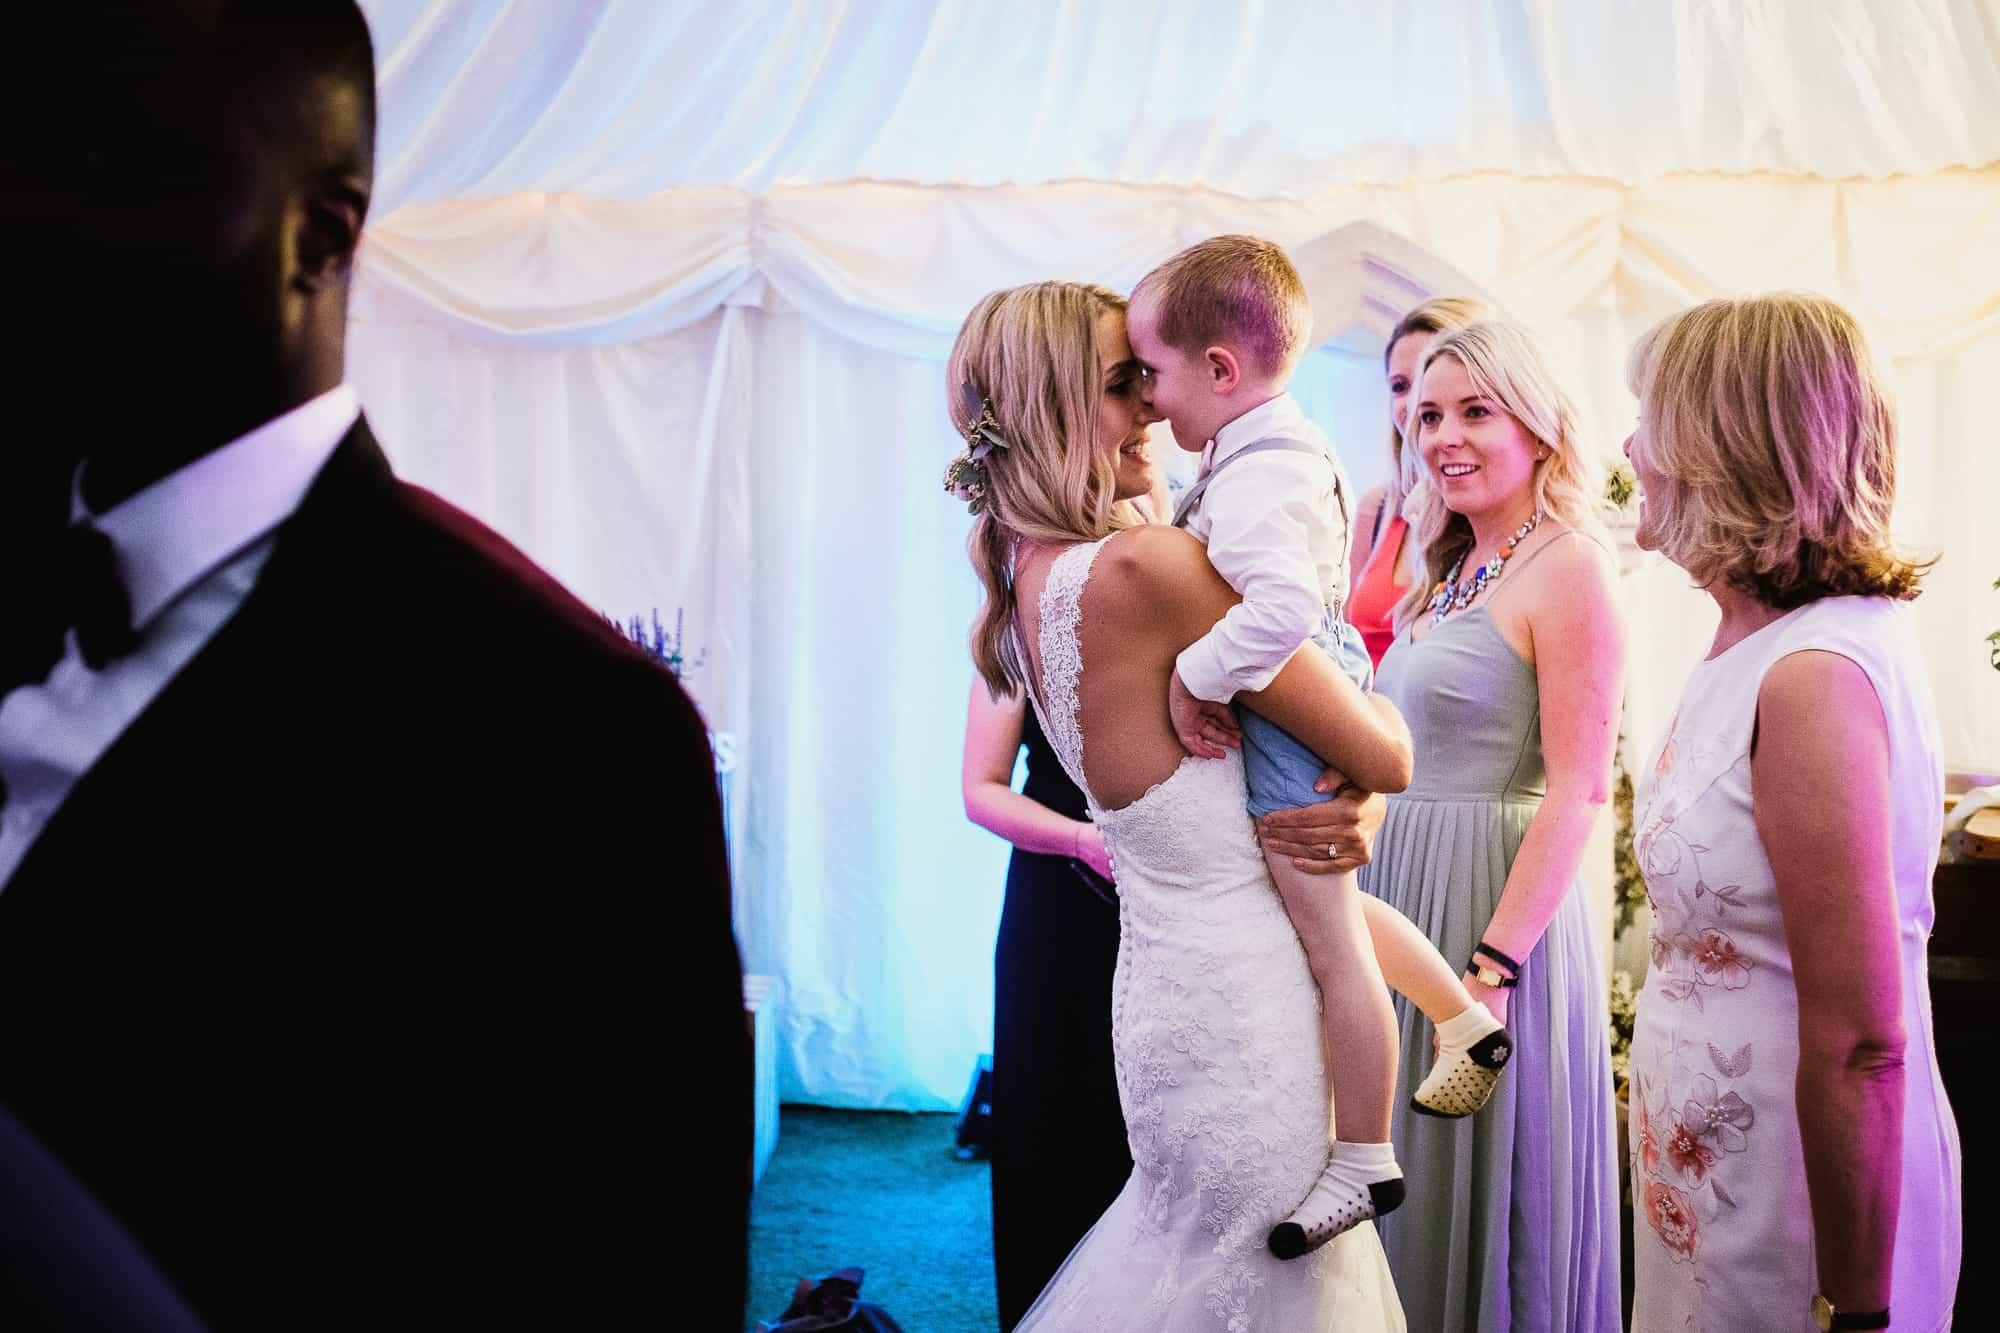 marleybrook-house-wedding-photography-matt-tyler-0061